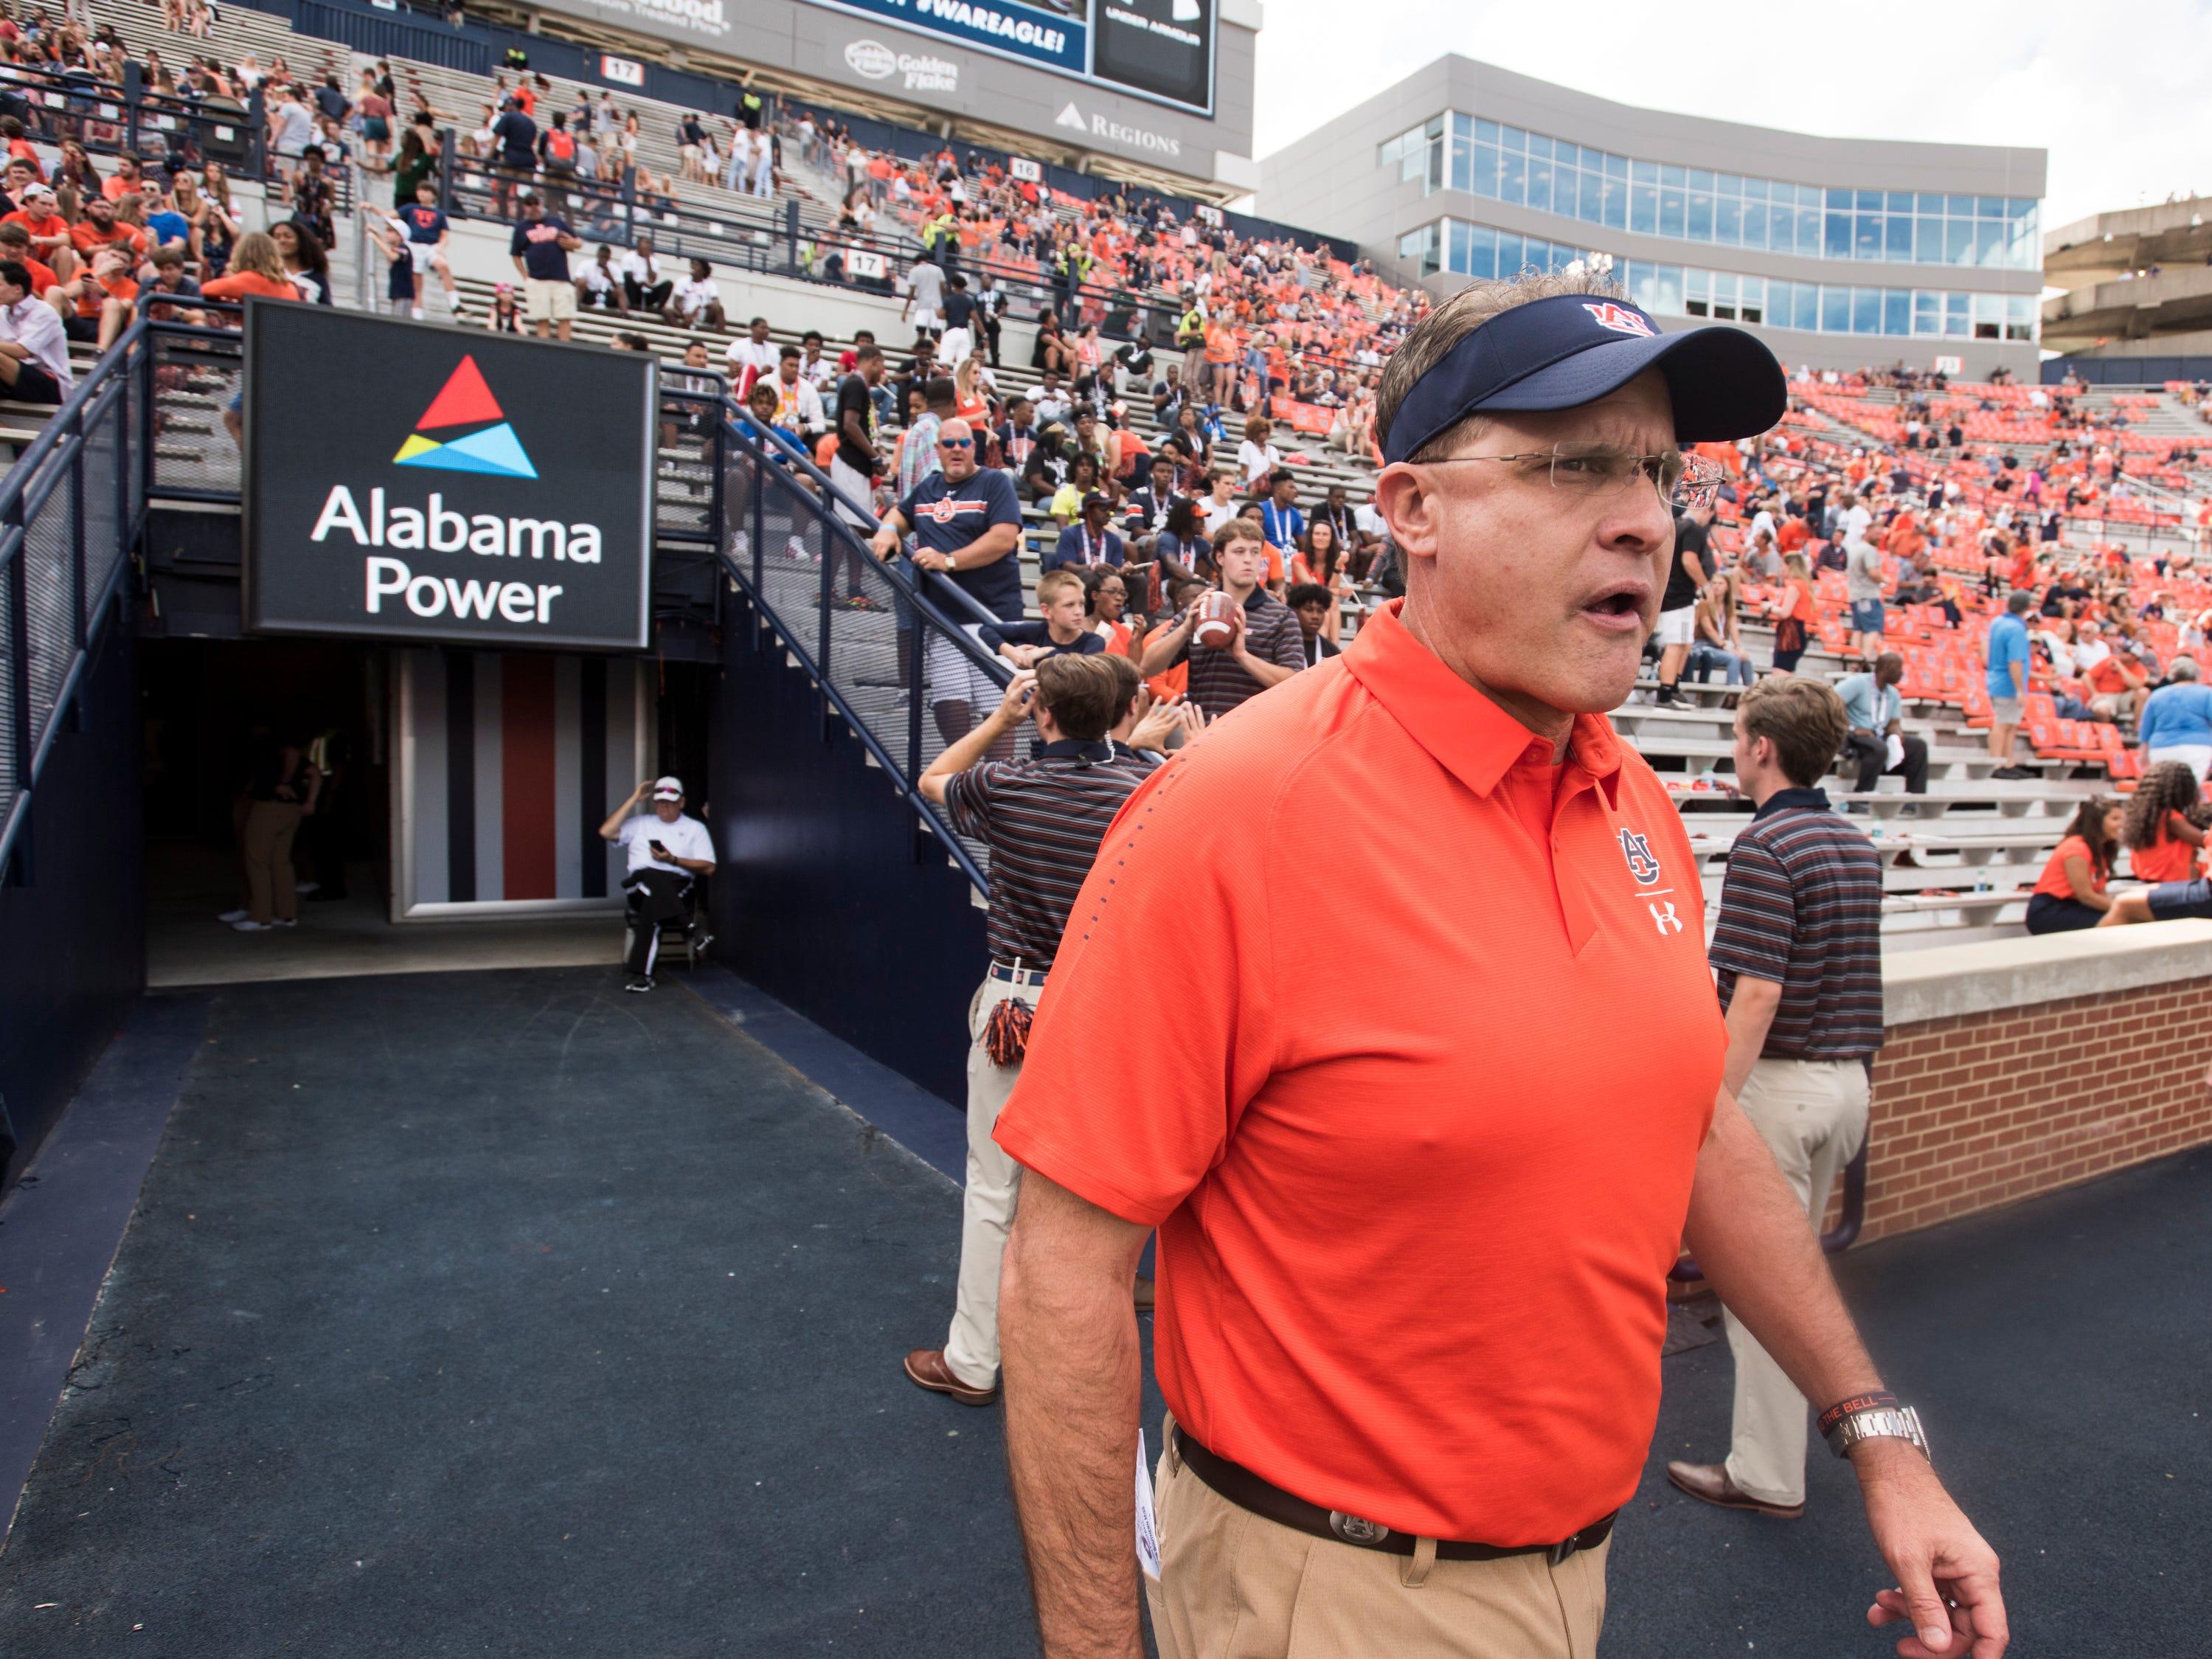 Auburn head coach Gus Malzahn walks on to the field for warm ups before taking on Southern Miss at Jordan-Hare Stadium in Auburn, Ala., on Saturday, Sept. 29, 2018.